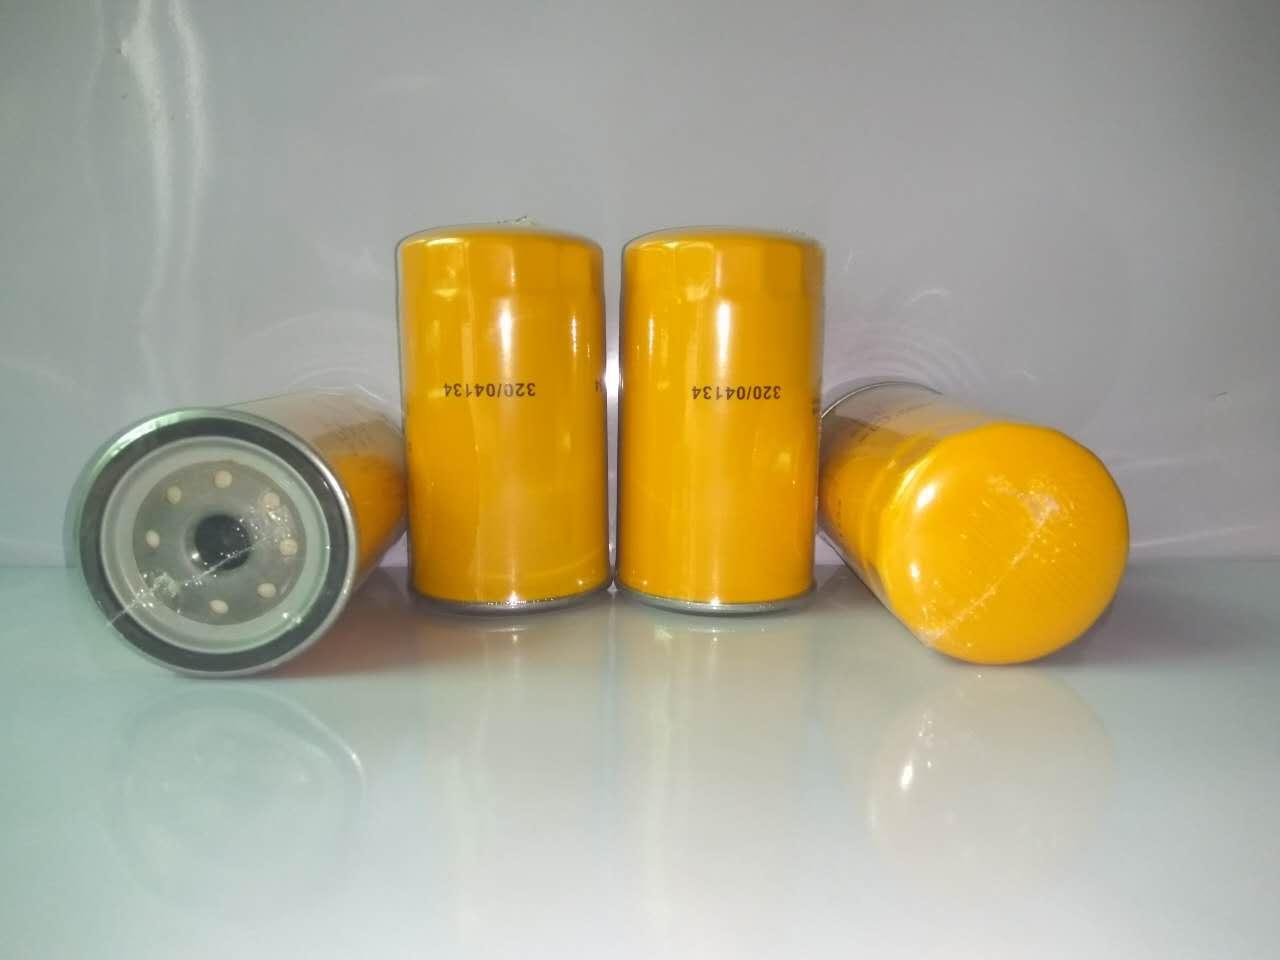 3DX Hot Sale JCB Oil Filter 320/04133 32004133 B7350 P502465 320/04133A 320/04134 W950/38